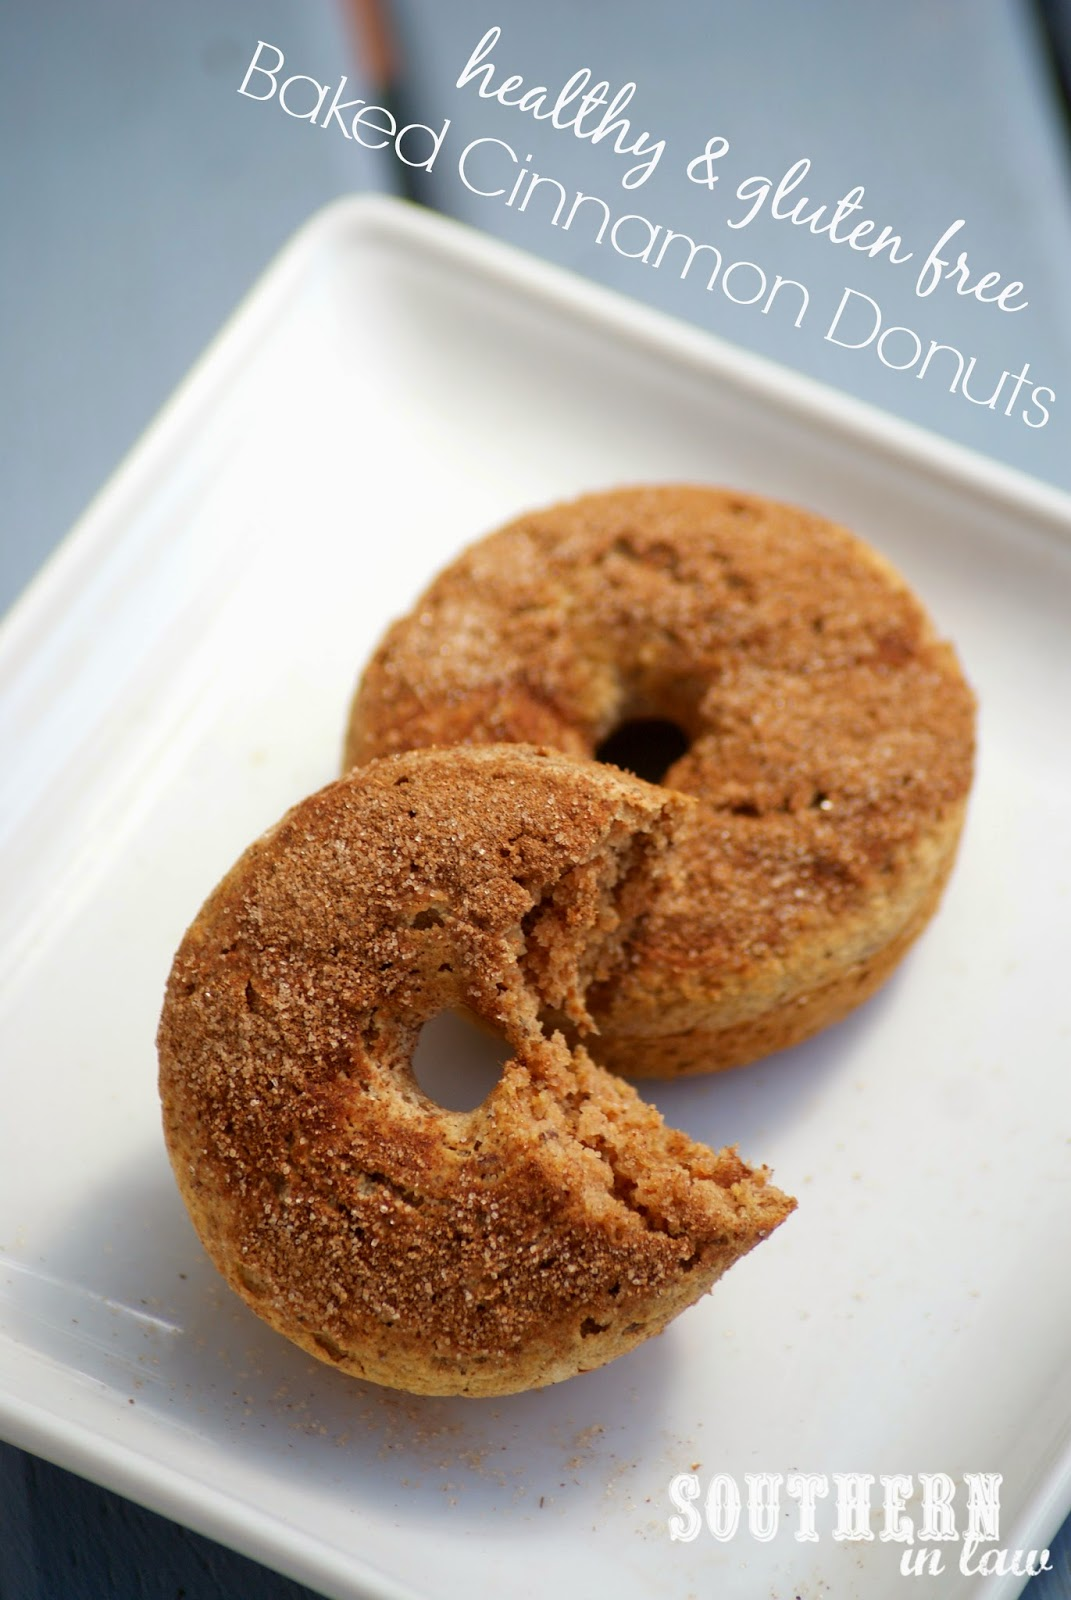 Vegan Baked Cinnamon Donuts Recipe - Gluten free, healthy, low fat, low sugar, egg free, dairy free